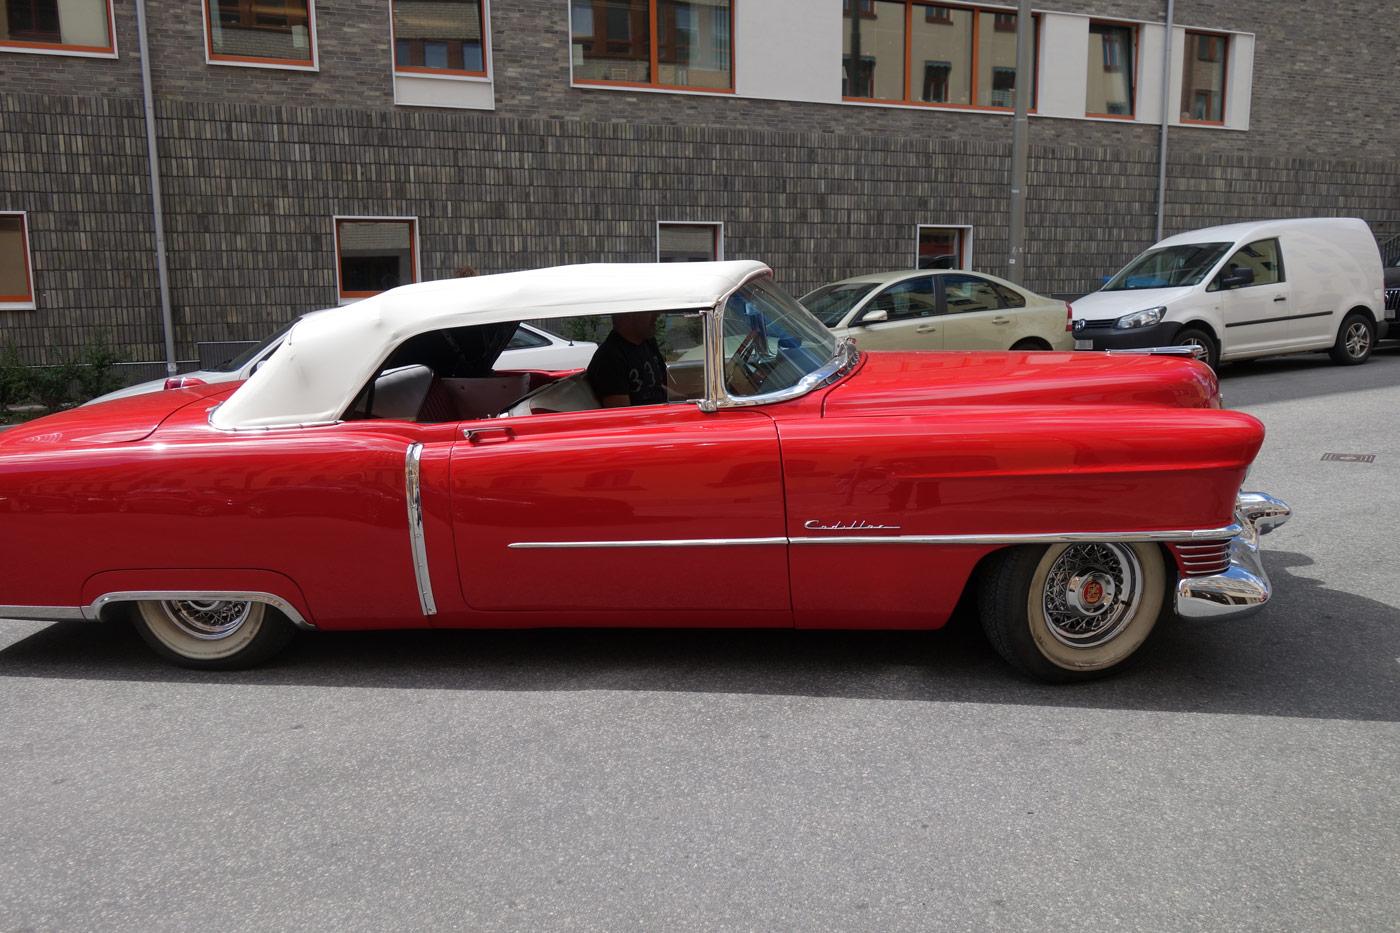 alfa-bilkladsel-cabriolet-cadillac-1954-img4 - Alfa Bilklädsel